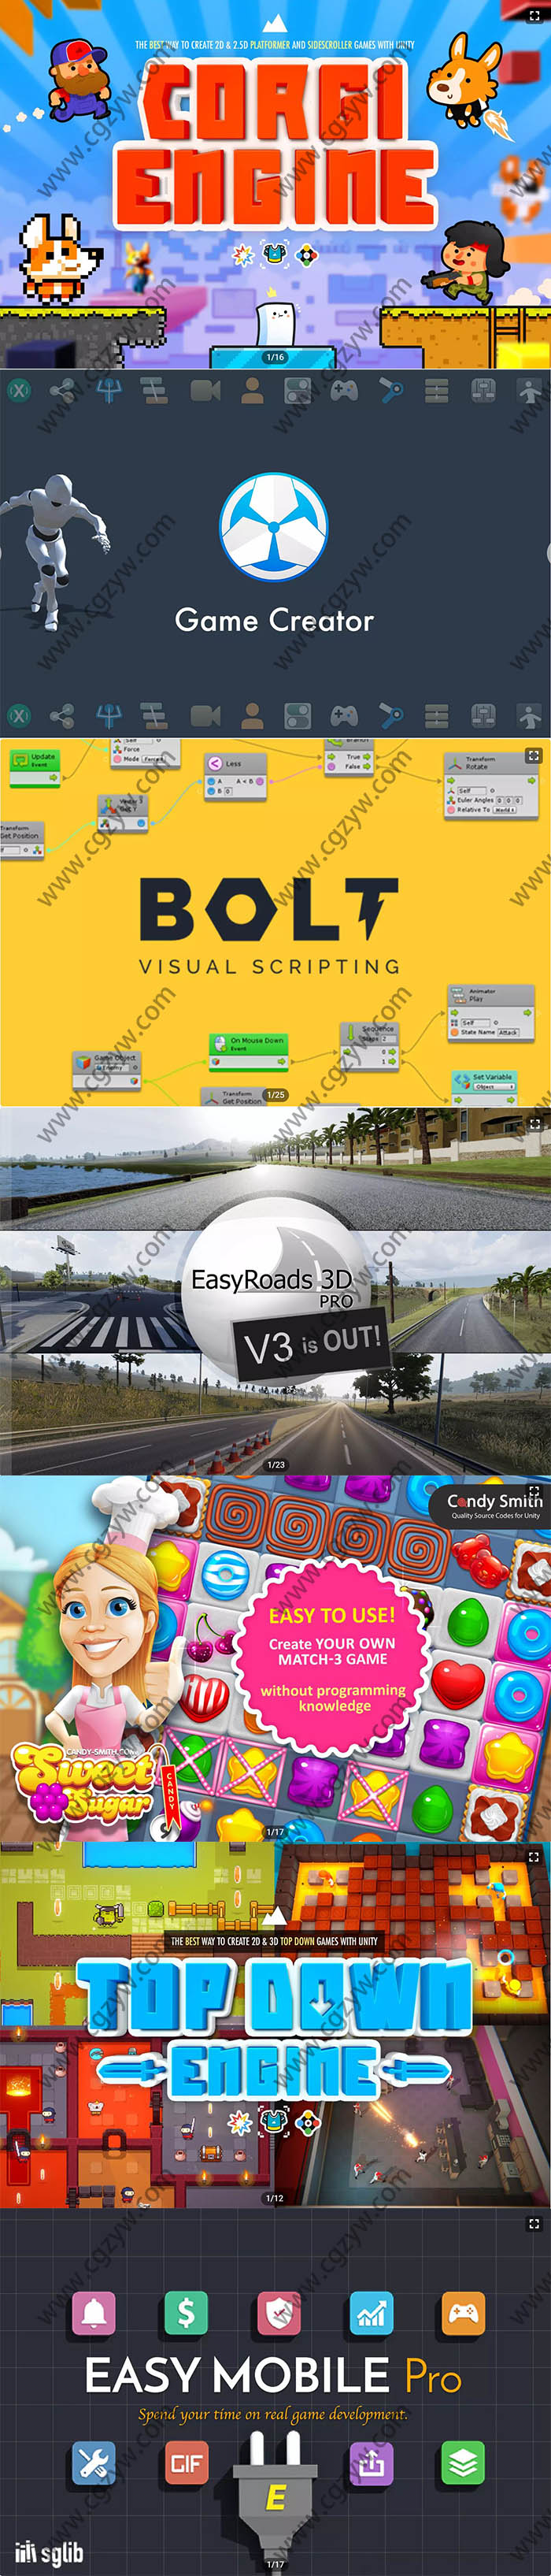 Unity游戏资源素材2020年4月合集第一波